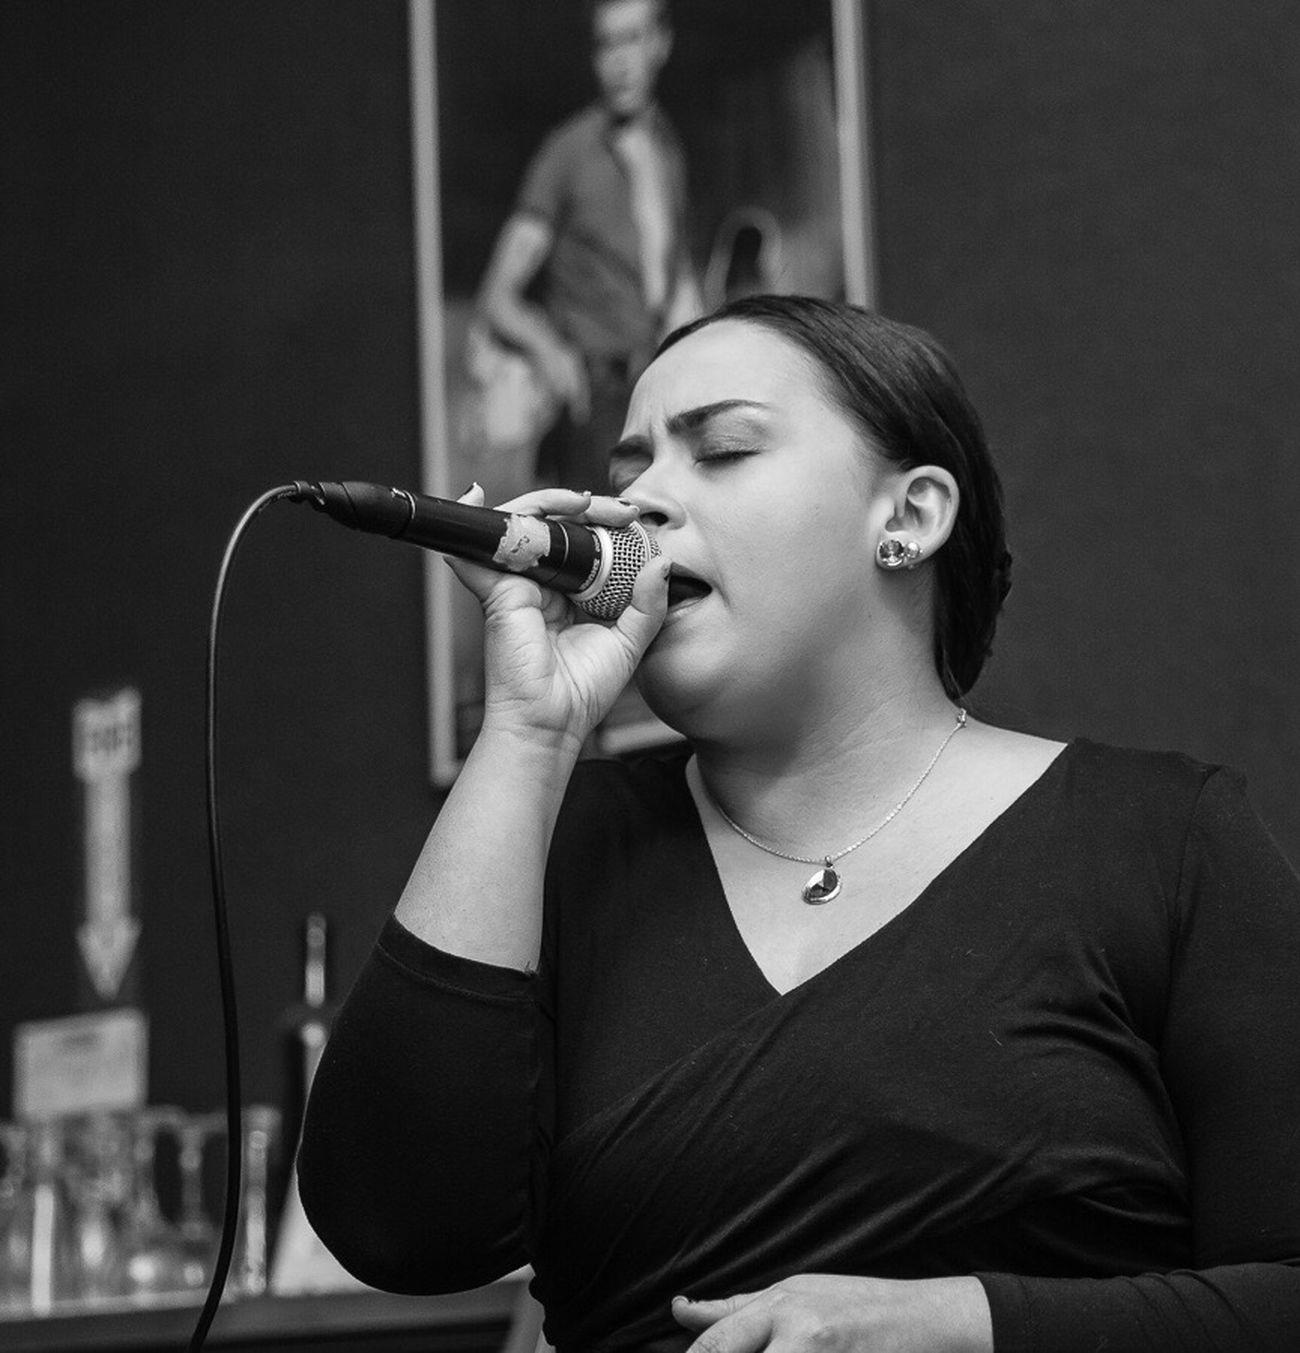 Templetx Musician Music Live Music Blackandwhite Photography Blackandwhitephoto EyeEm Best Shots - Black + White EyeEm Black&white! People Watching Taking Photos TeamCanon EyeEmTexas People Of EyeEm